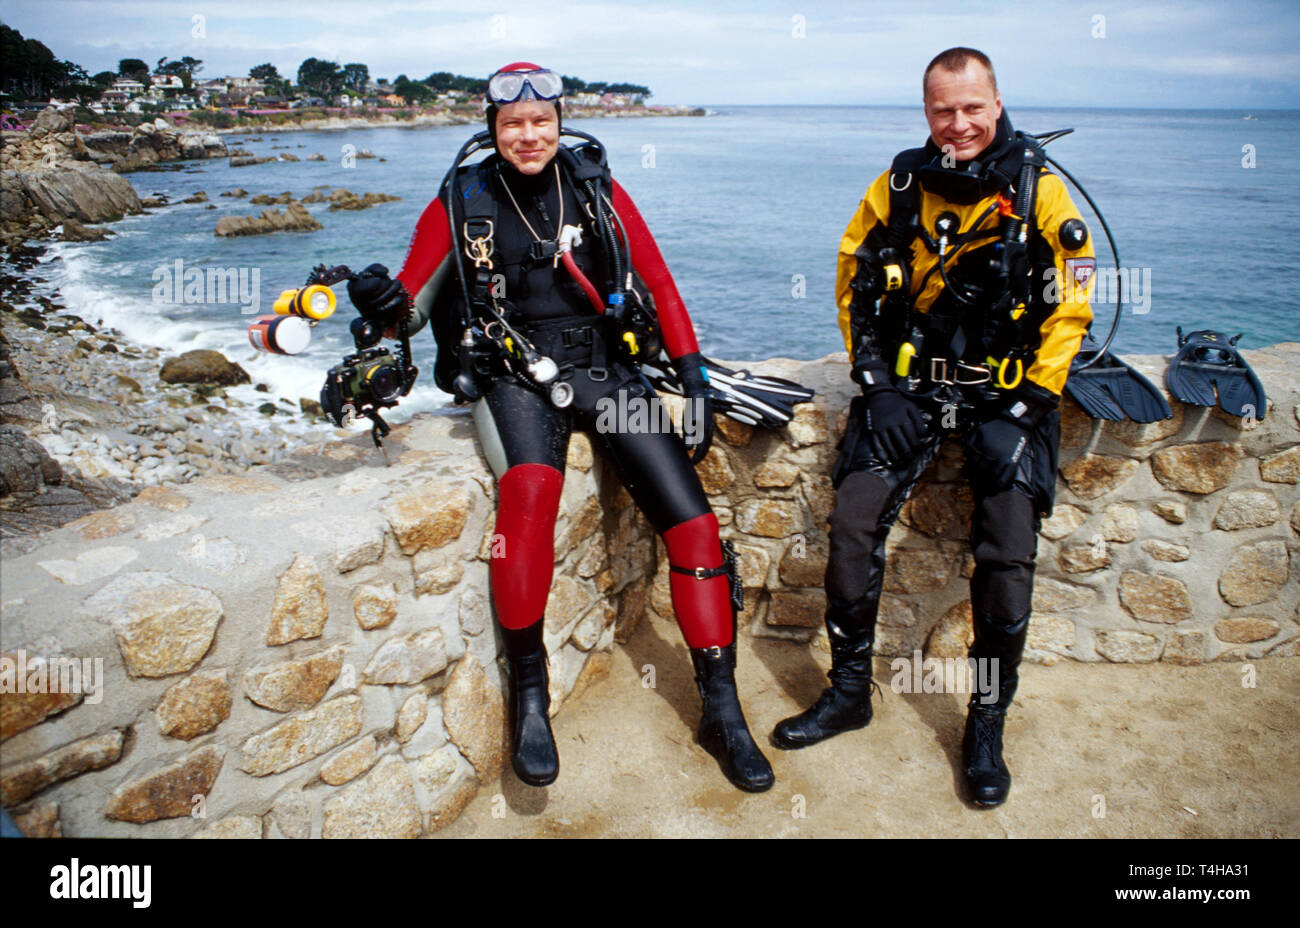 California Monterey Bay Lover's Point scuba divers - Stock Image